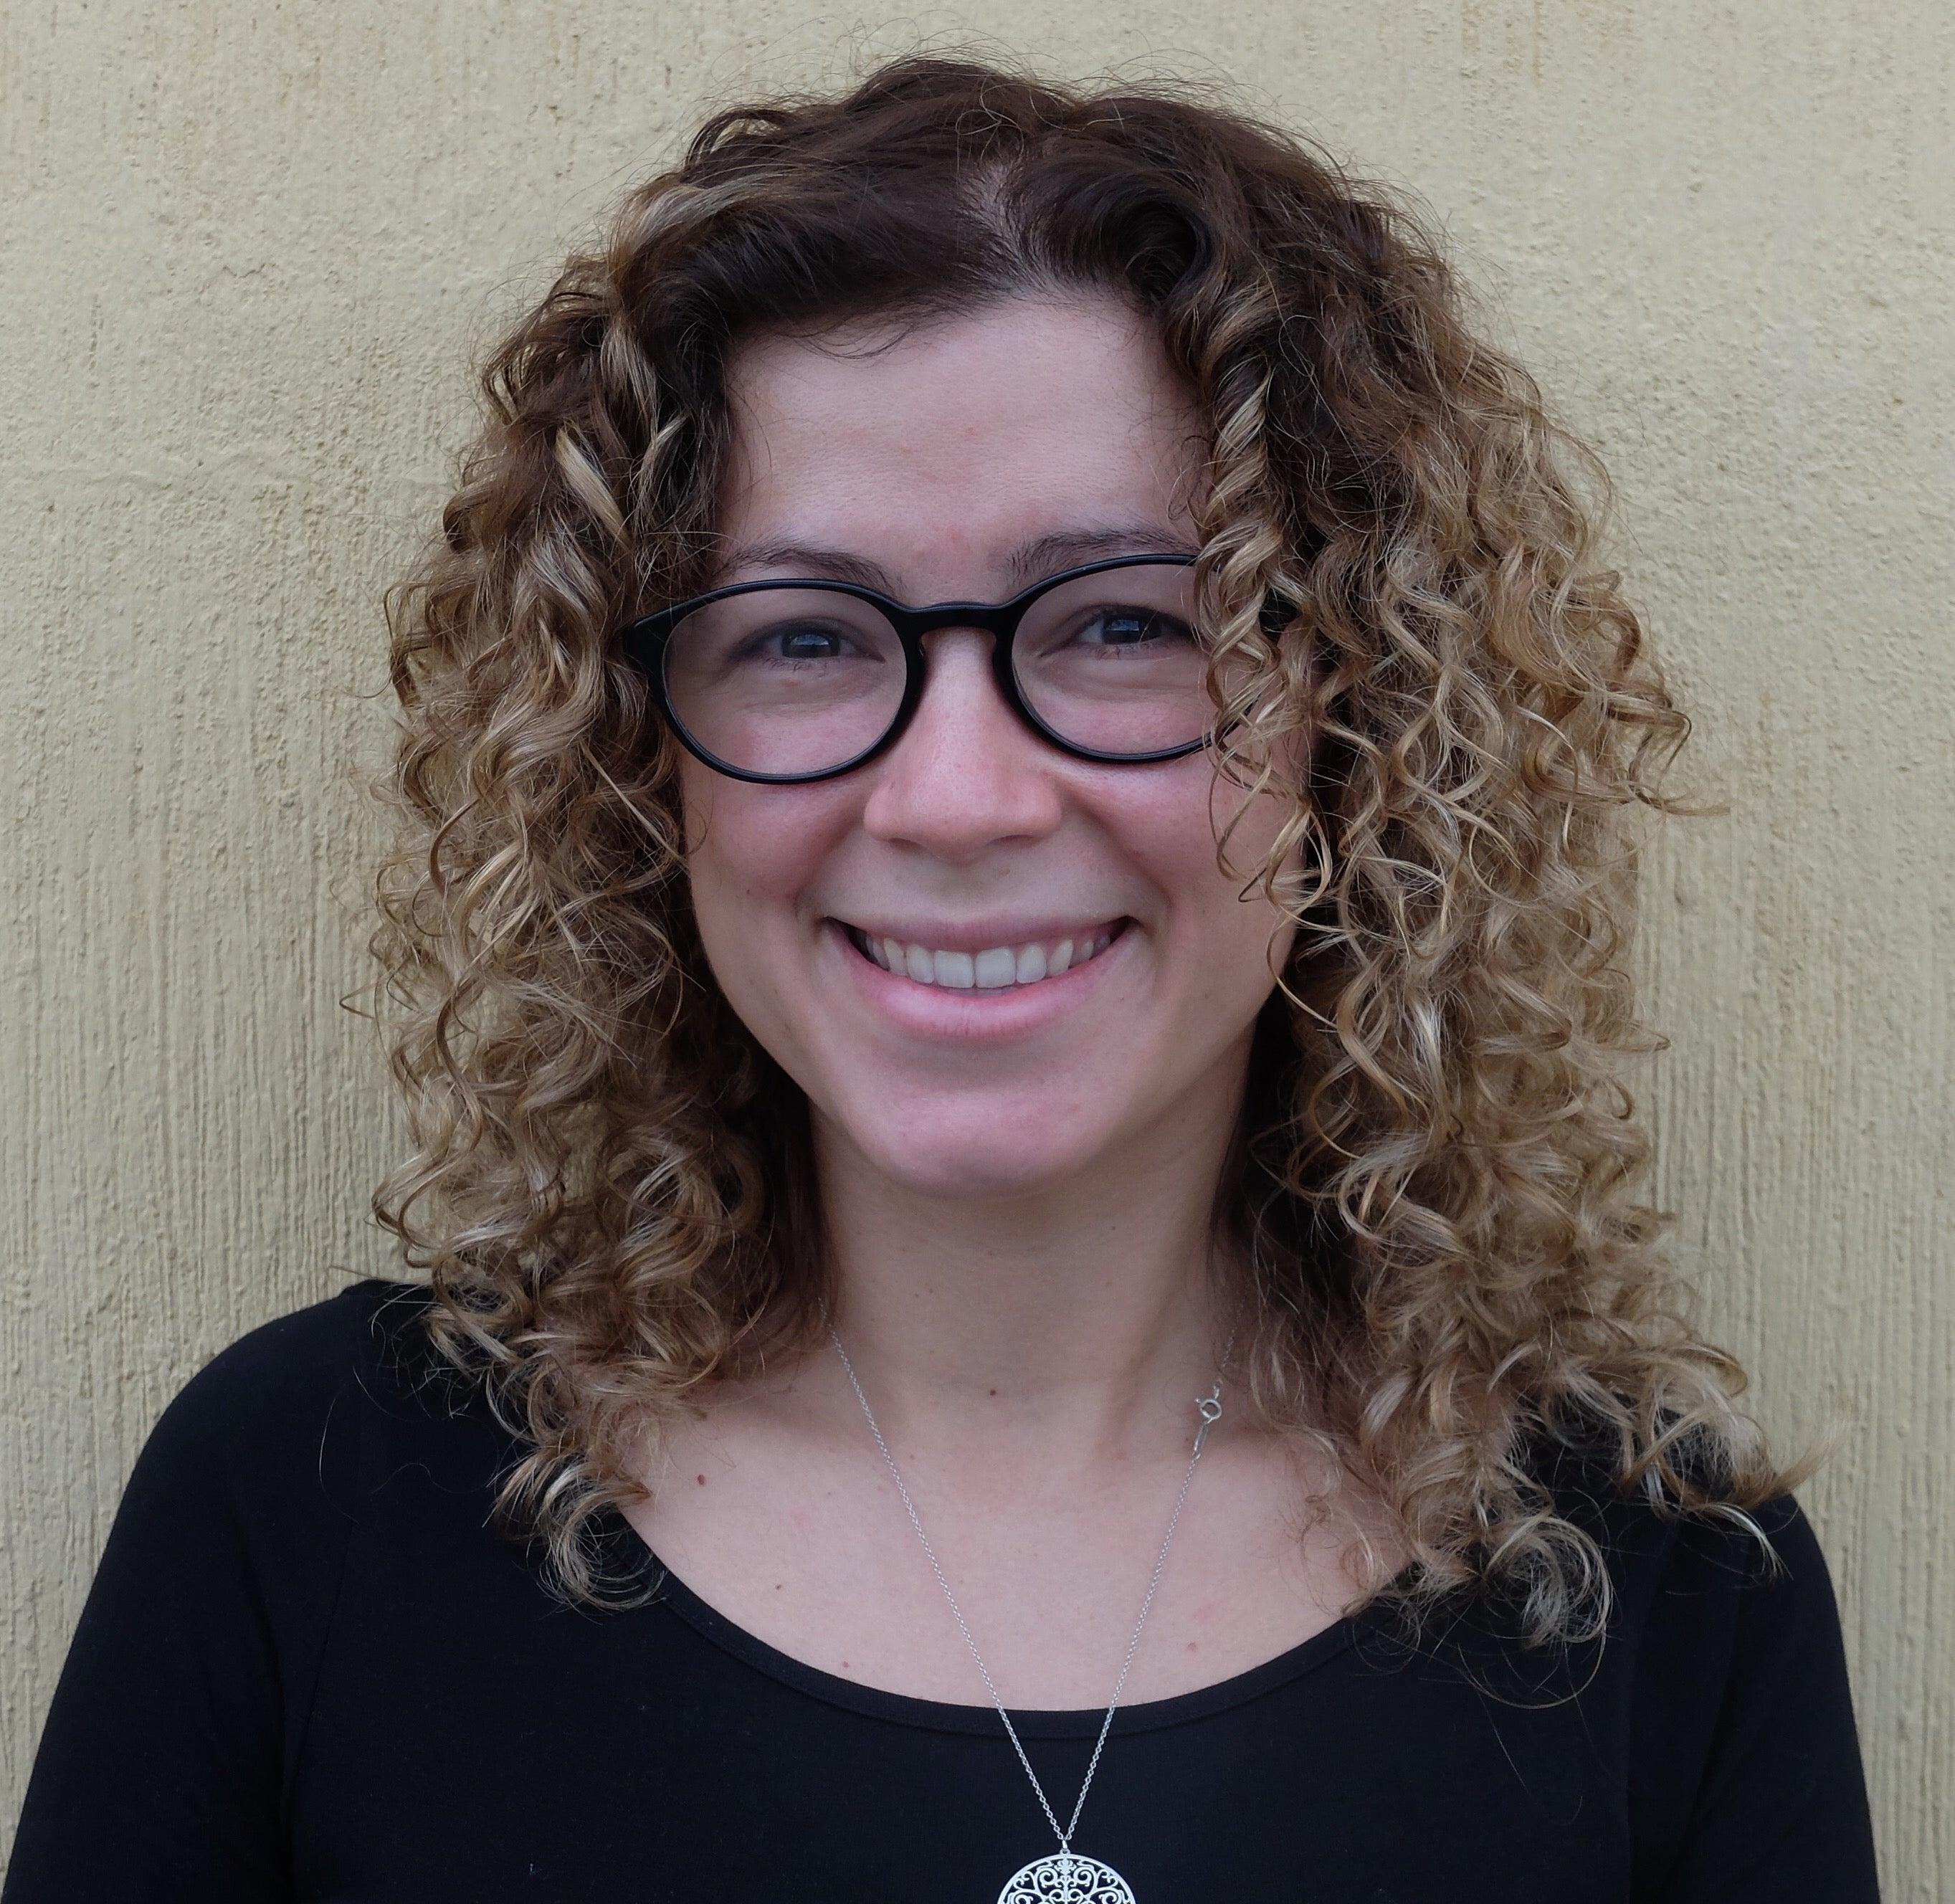 Ana Lorena Ruano